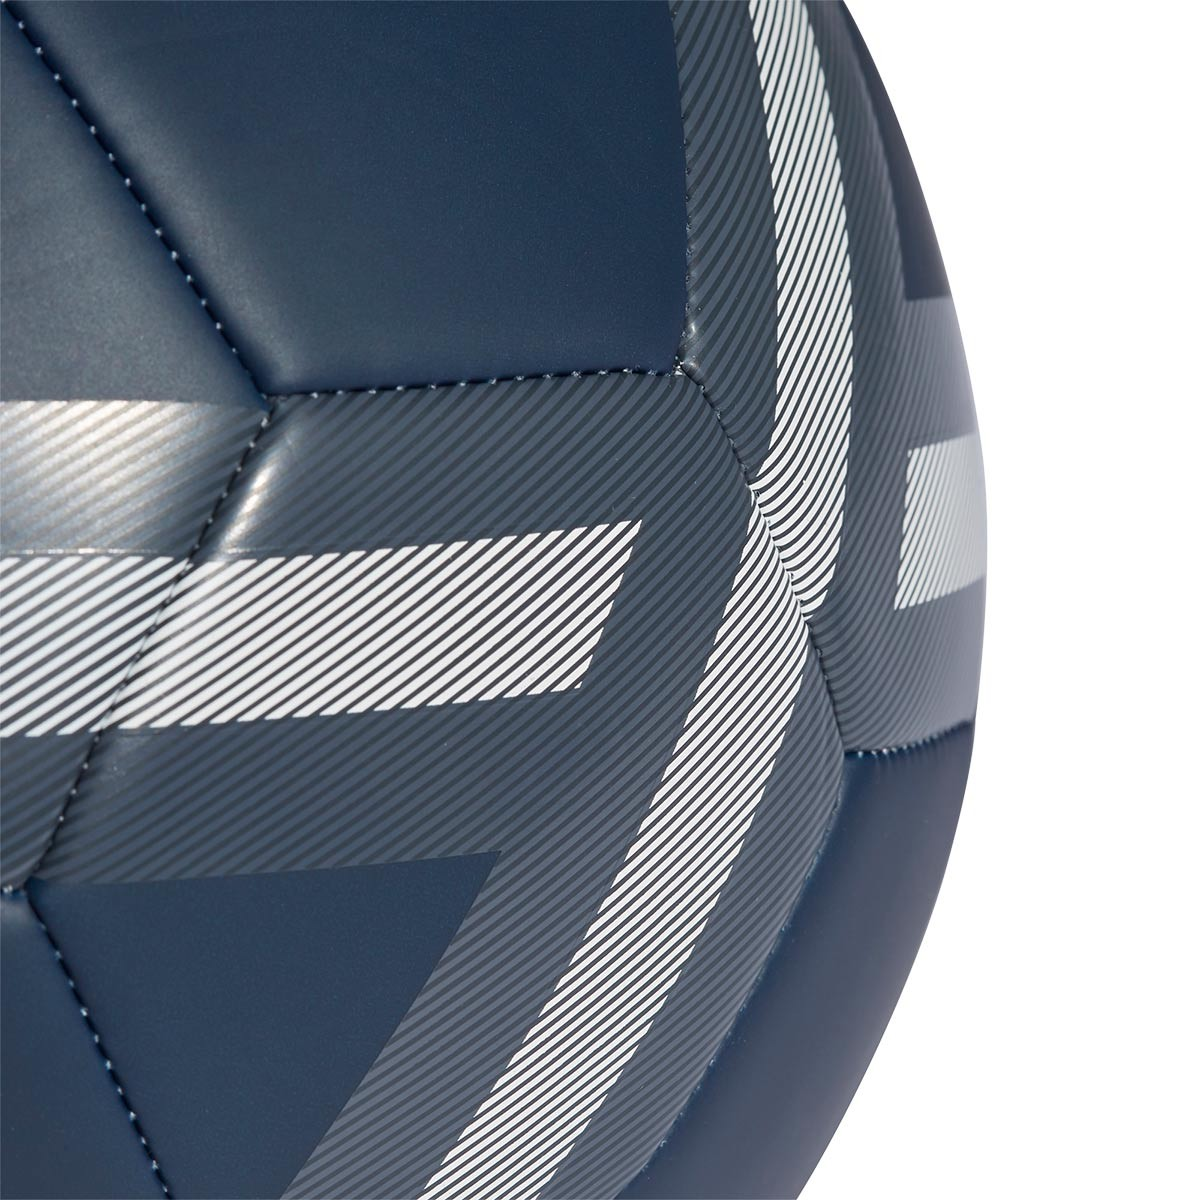 bec909facef1e Ball adidas Real Madrid 2018-2019 Tech-onix-Bold onix-White - Football  store Fútbol Emotion